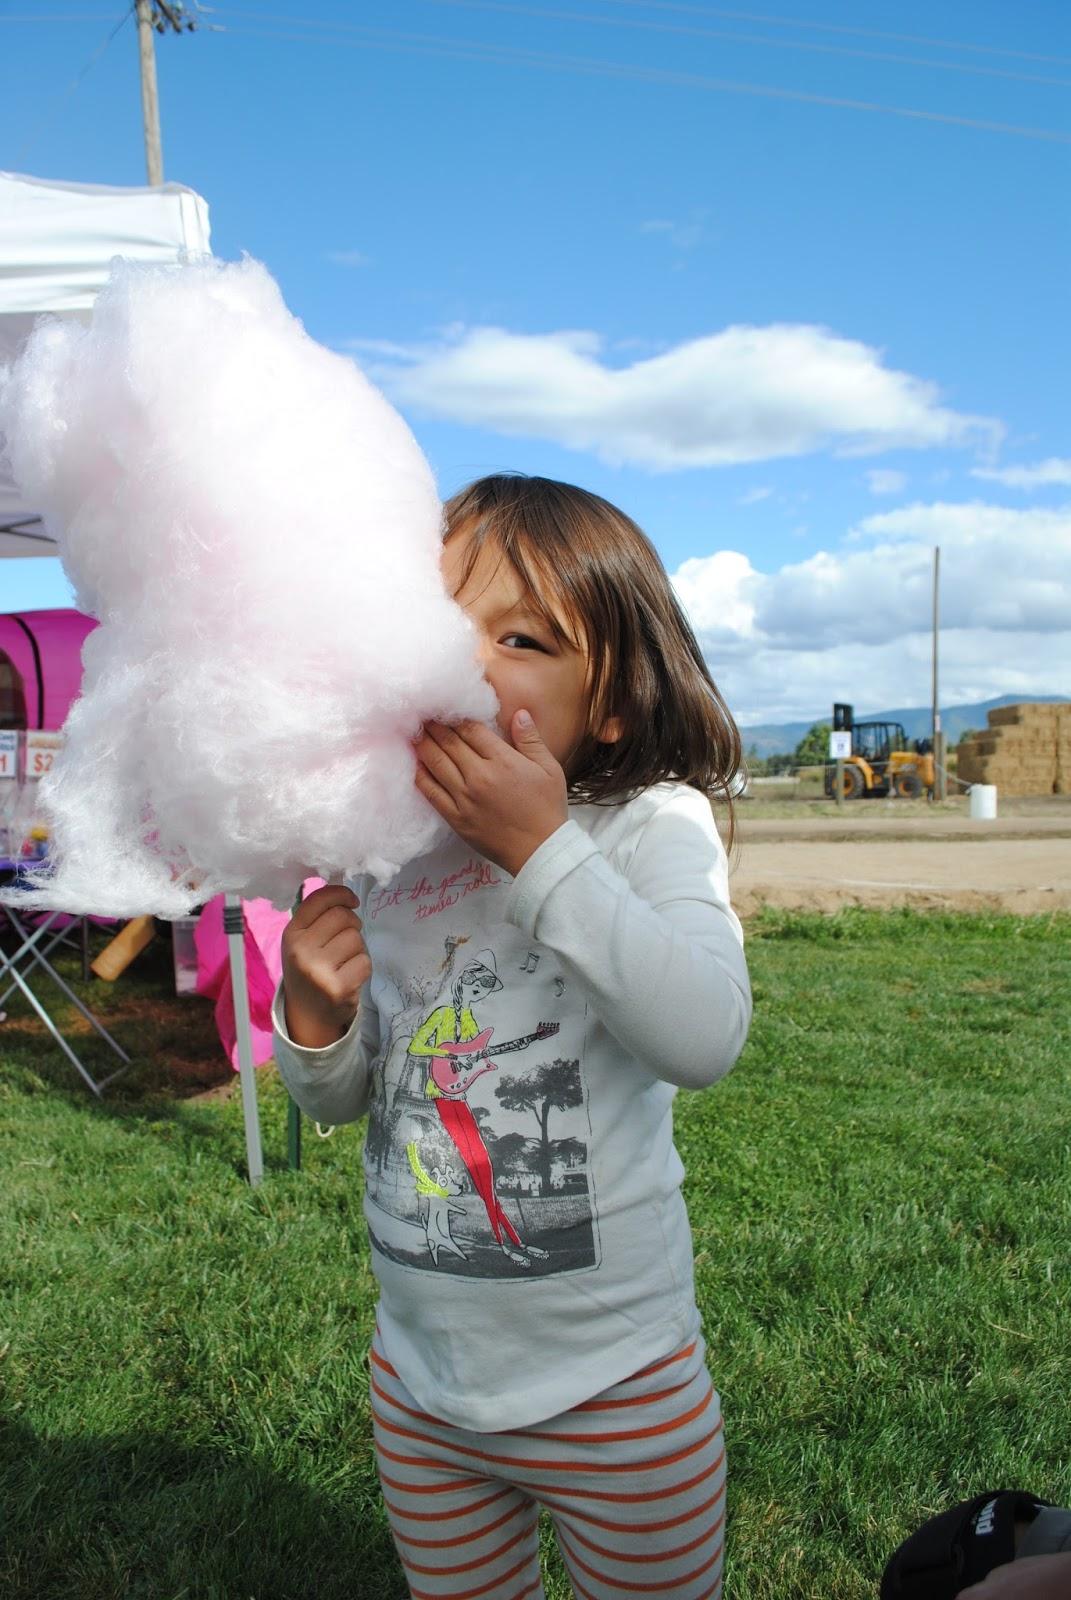 Fort Vannoy Farms Harvest Festival - Grants Pass, Oregon - Josephine County - Rogue Valley - Southern Oregon - Fall - Autumn - Pumpkin Patch - Corn Maze - Hayrides (150).JPG